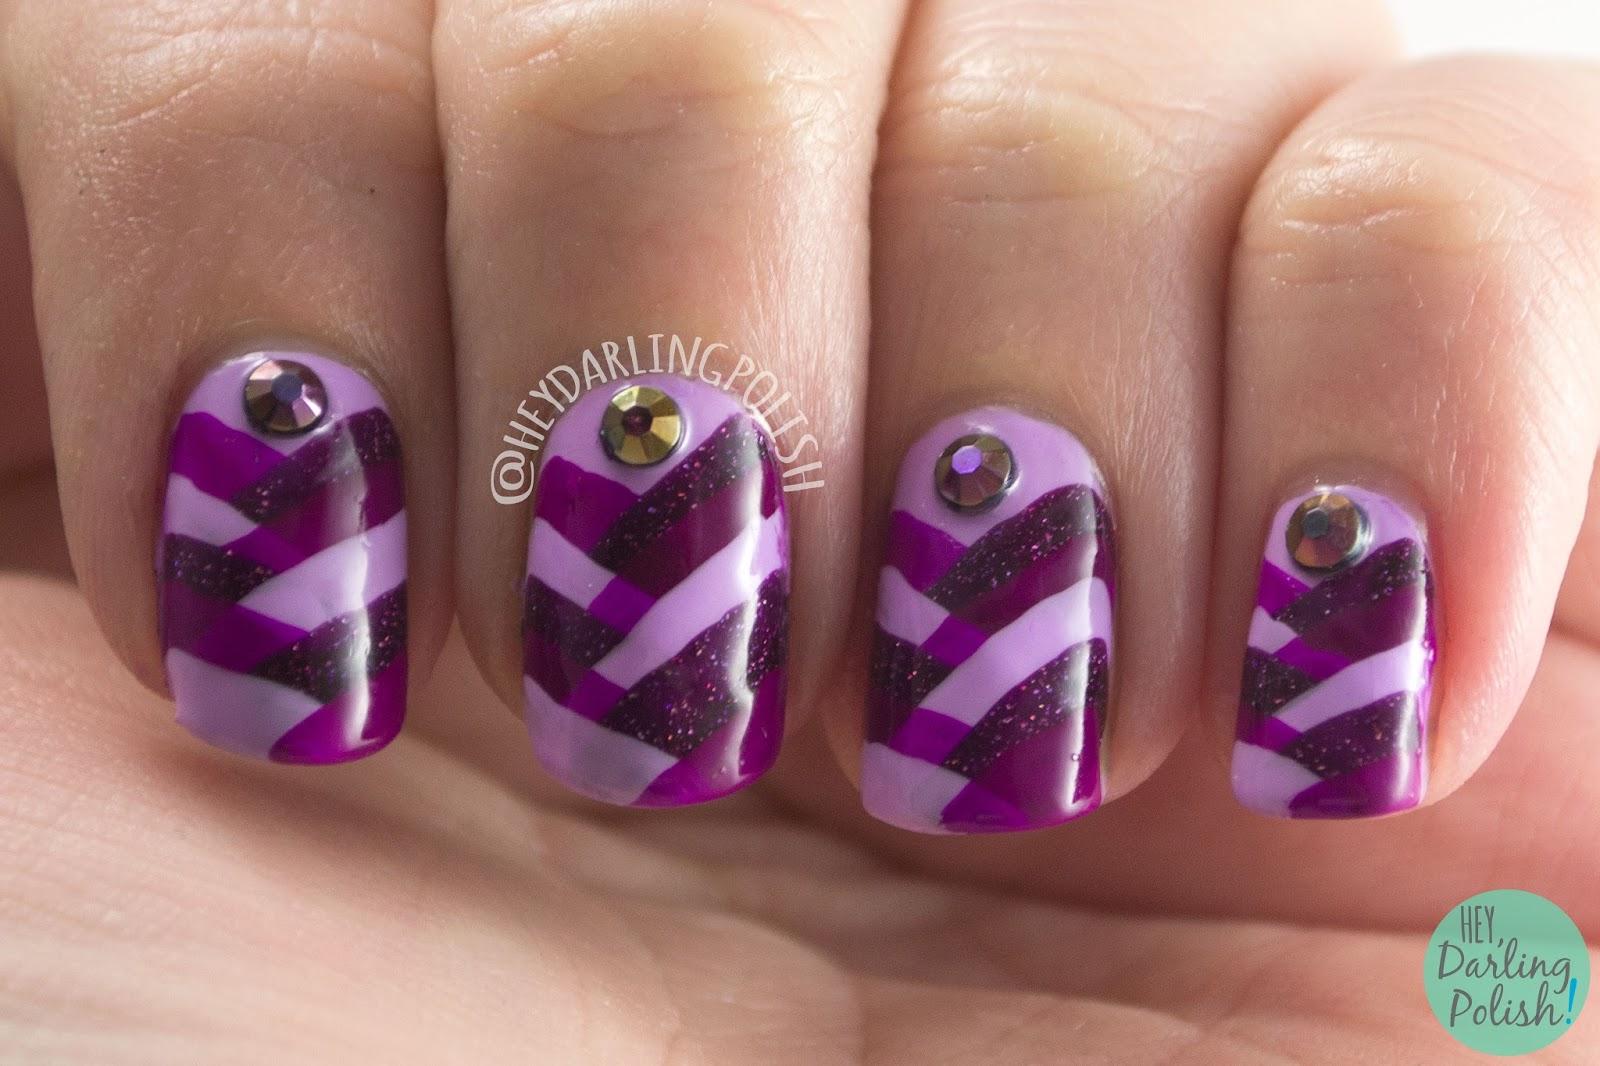 nails, nail art, nail polish, fish tail, purple, hey darling polish, rhinestones, monochrome, 2015 cnt 31 day challenge